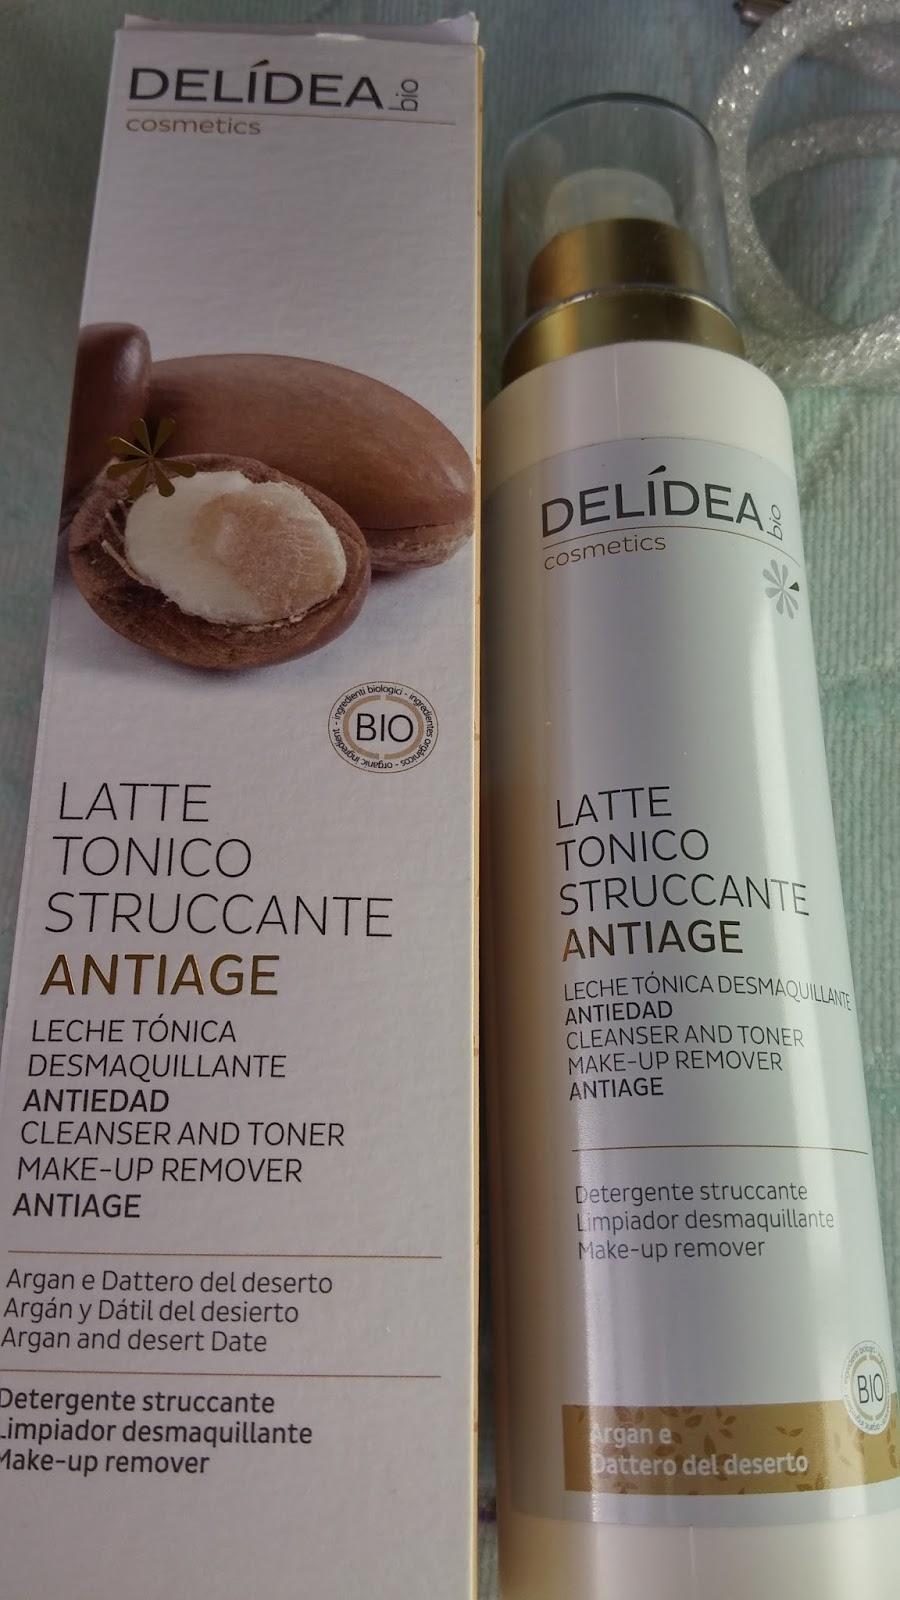 Delidea Bio Cosmetics, Latte tonico struccante antiage